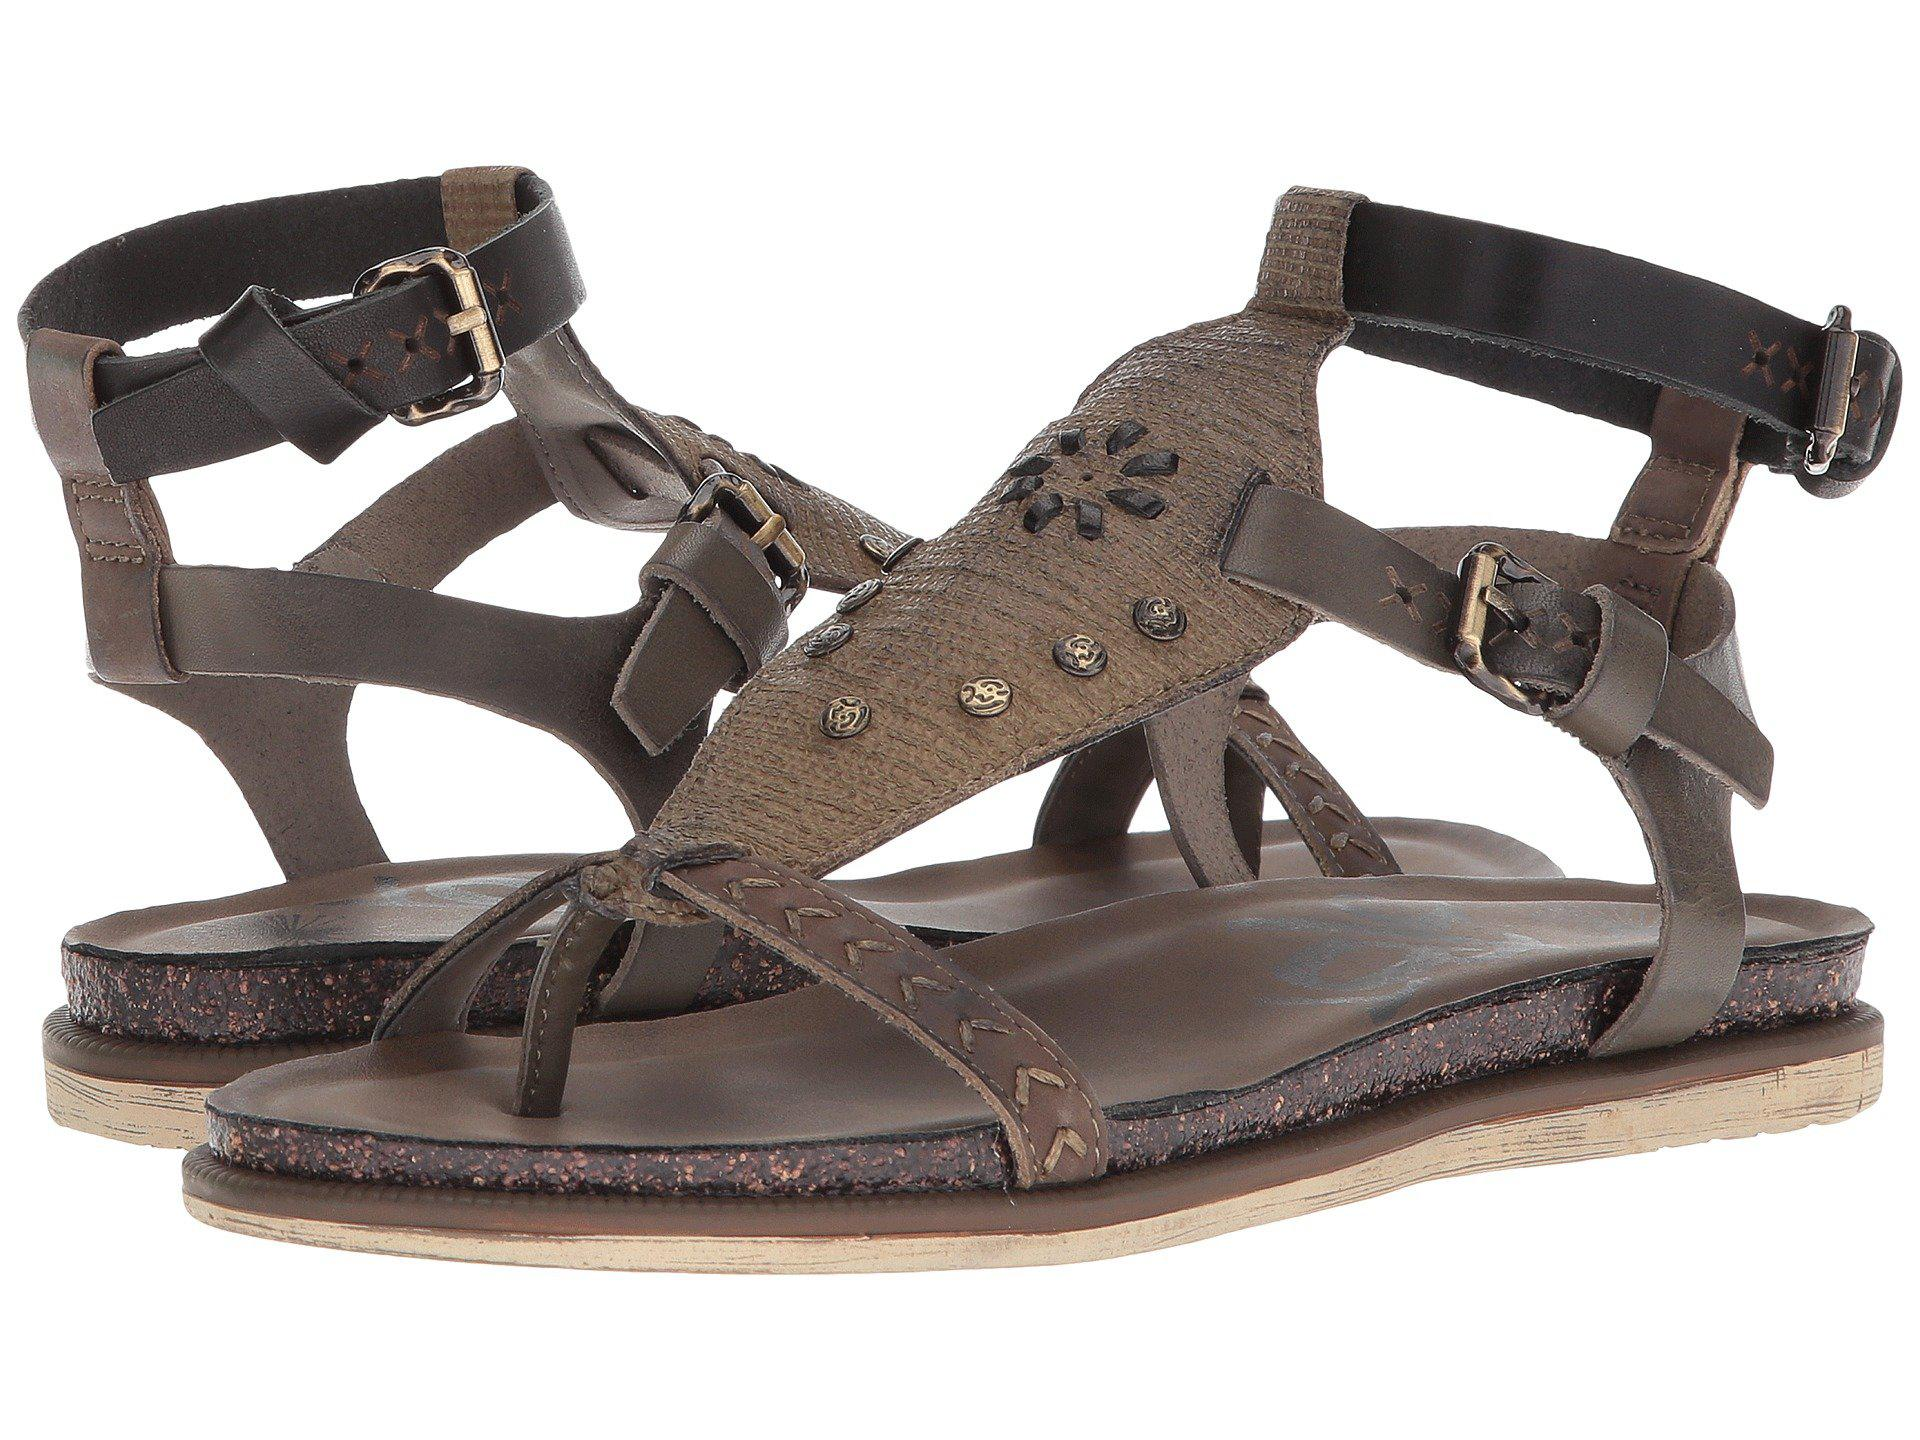 e13f347b4 Lyst - Otbt Stargaze (black) Women s Sandals